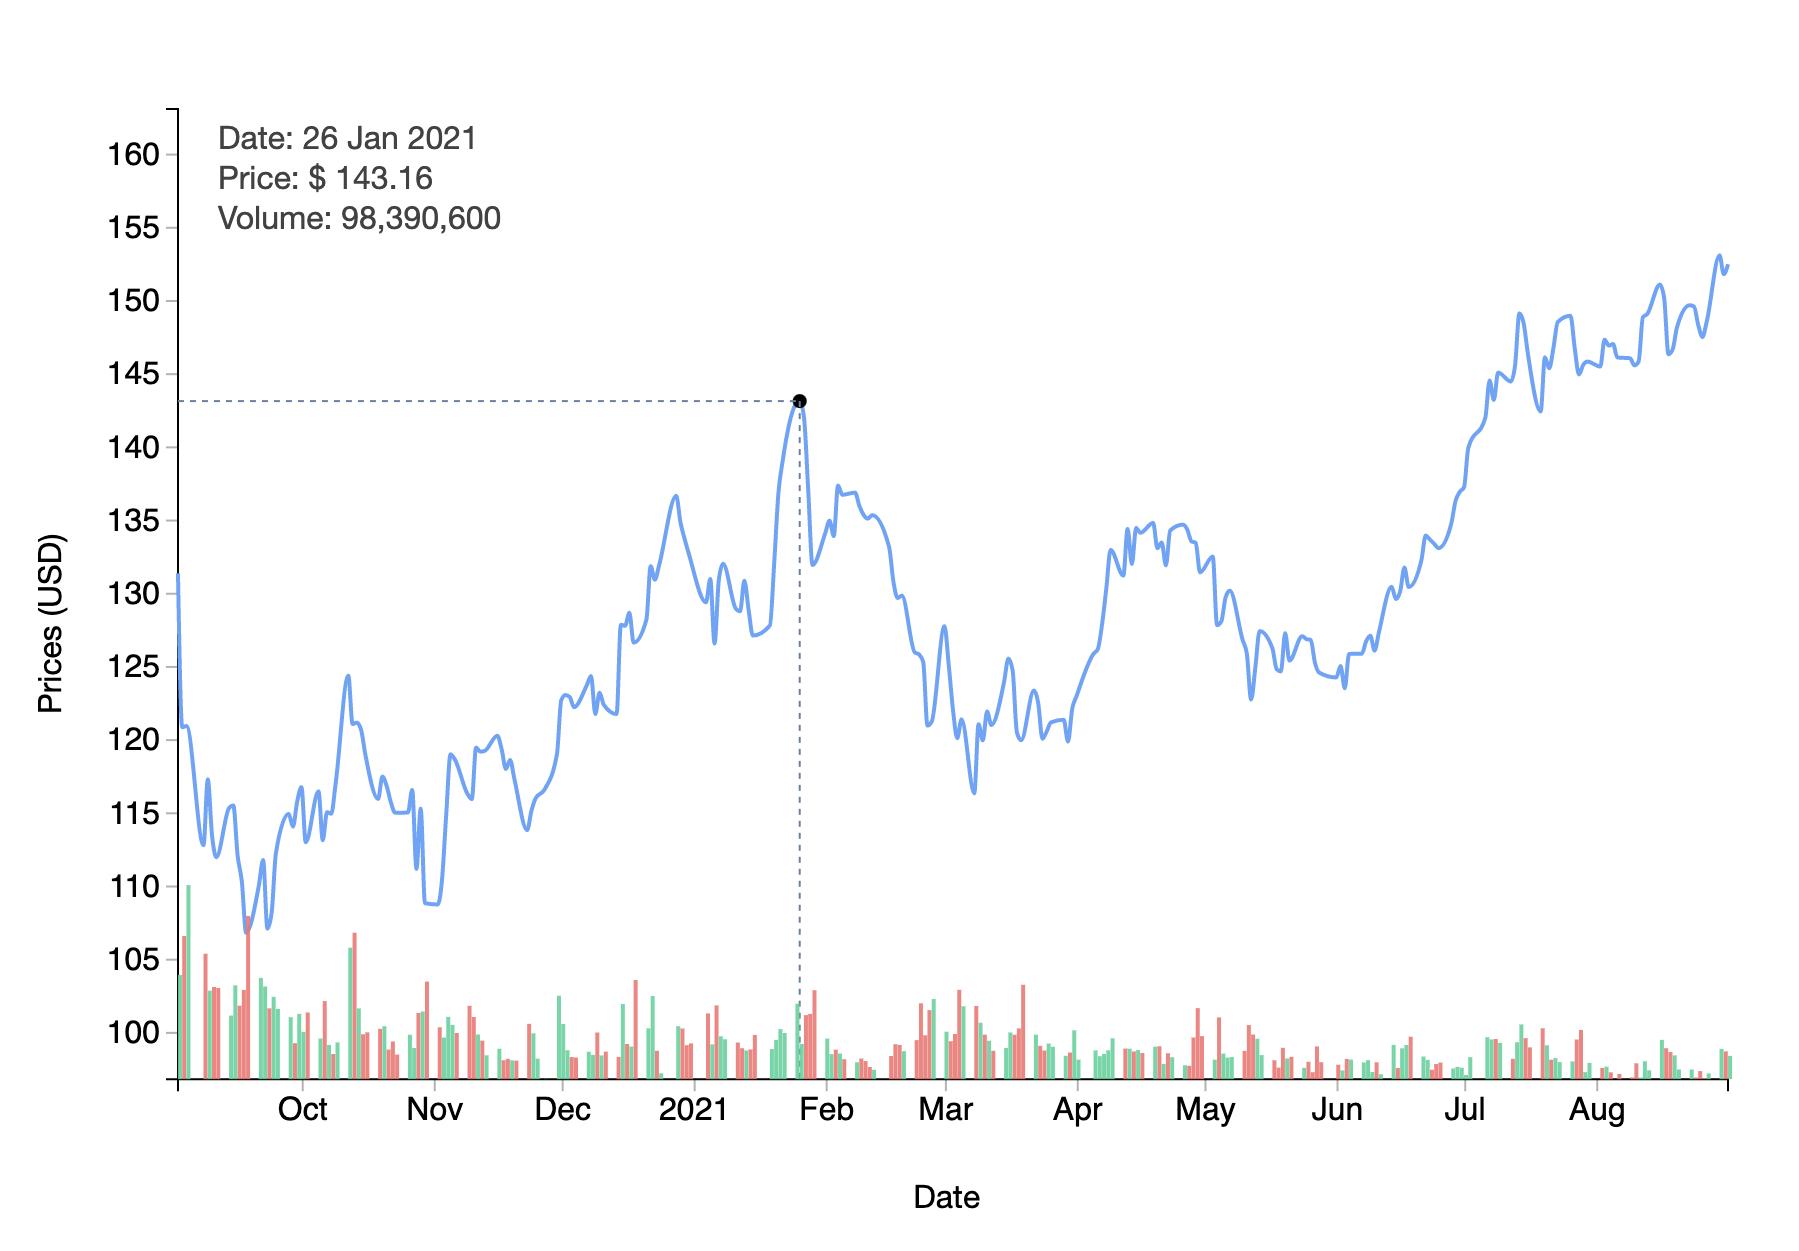 Asset Price and Volume.